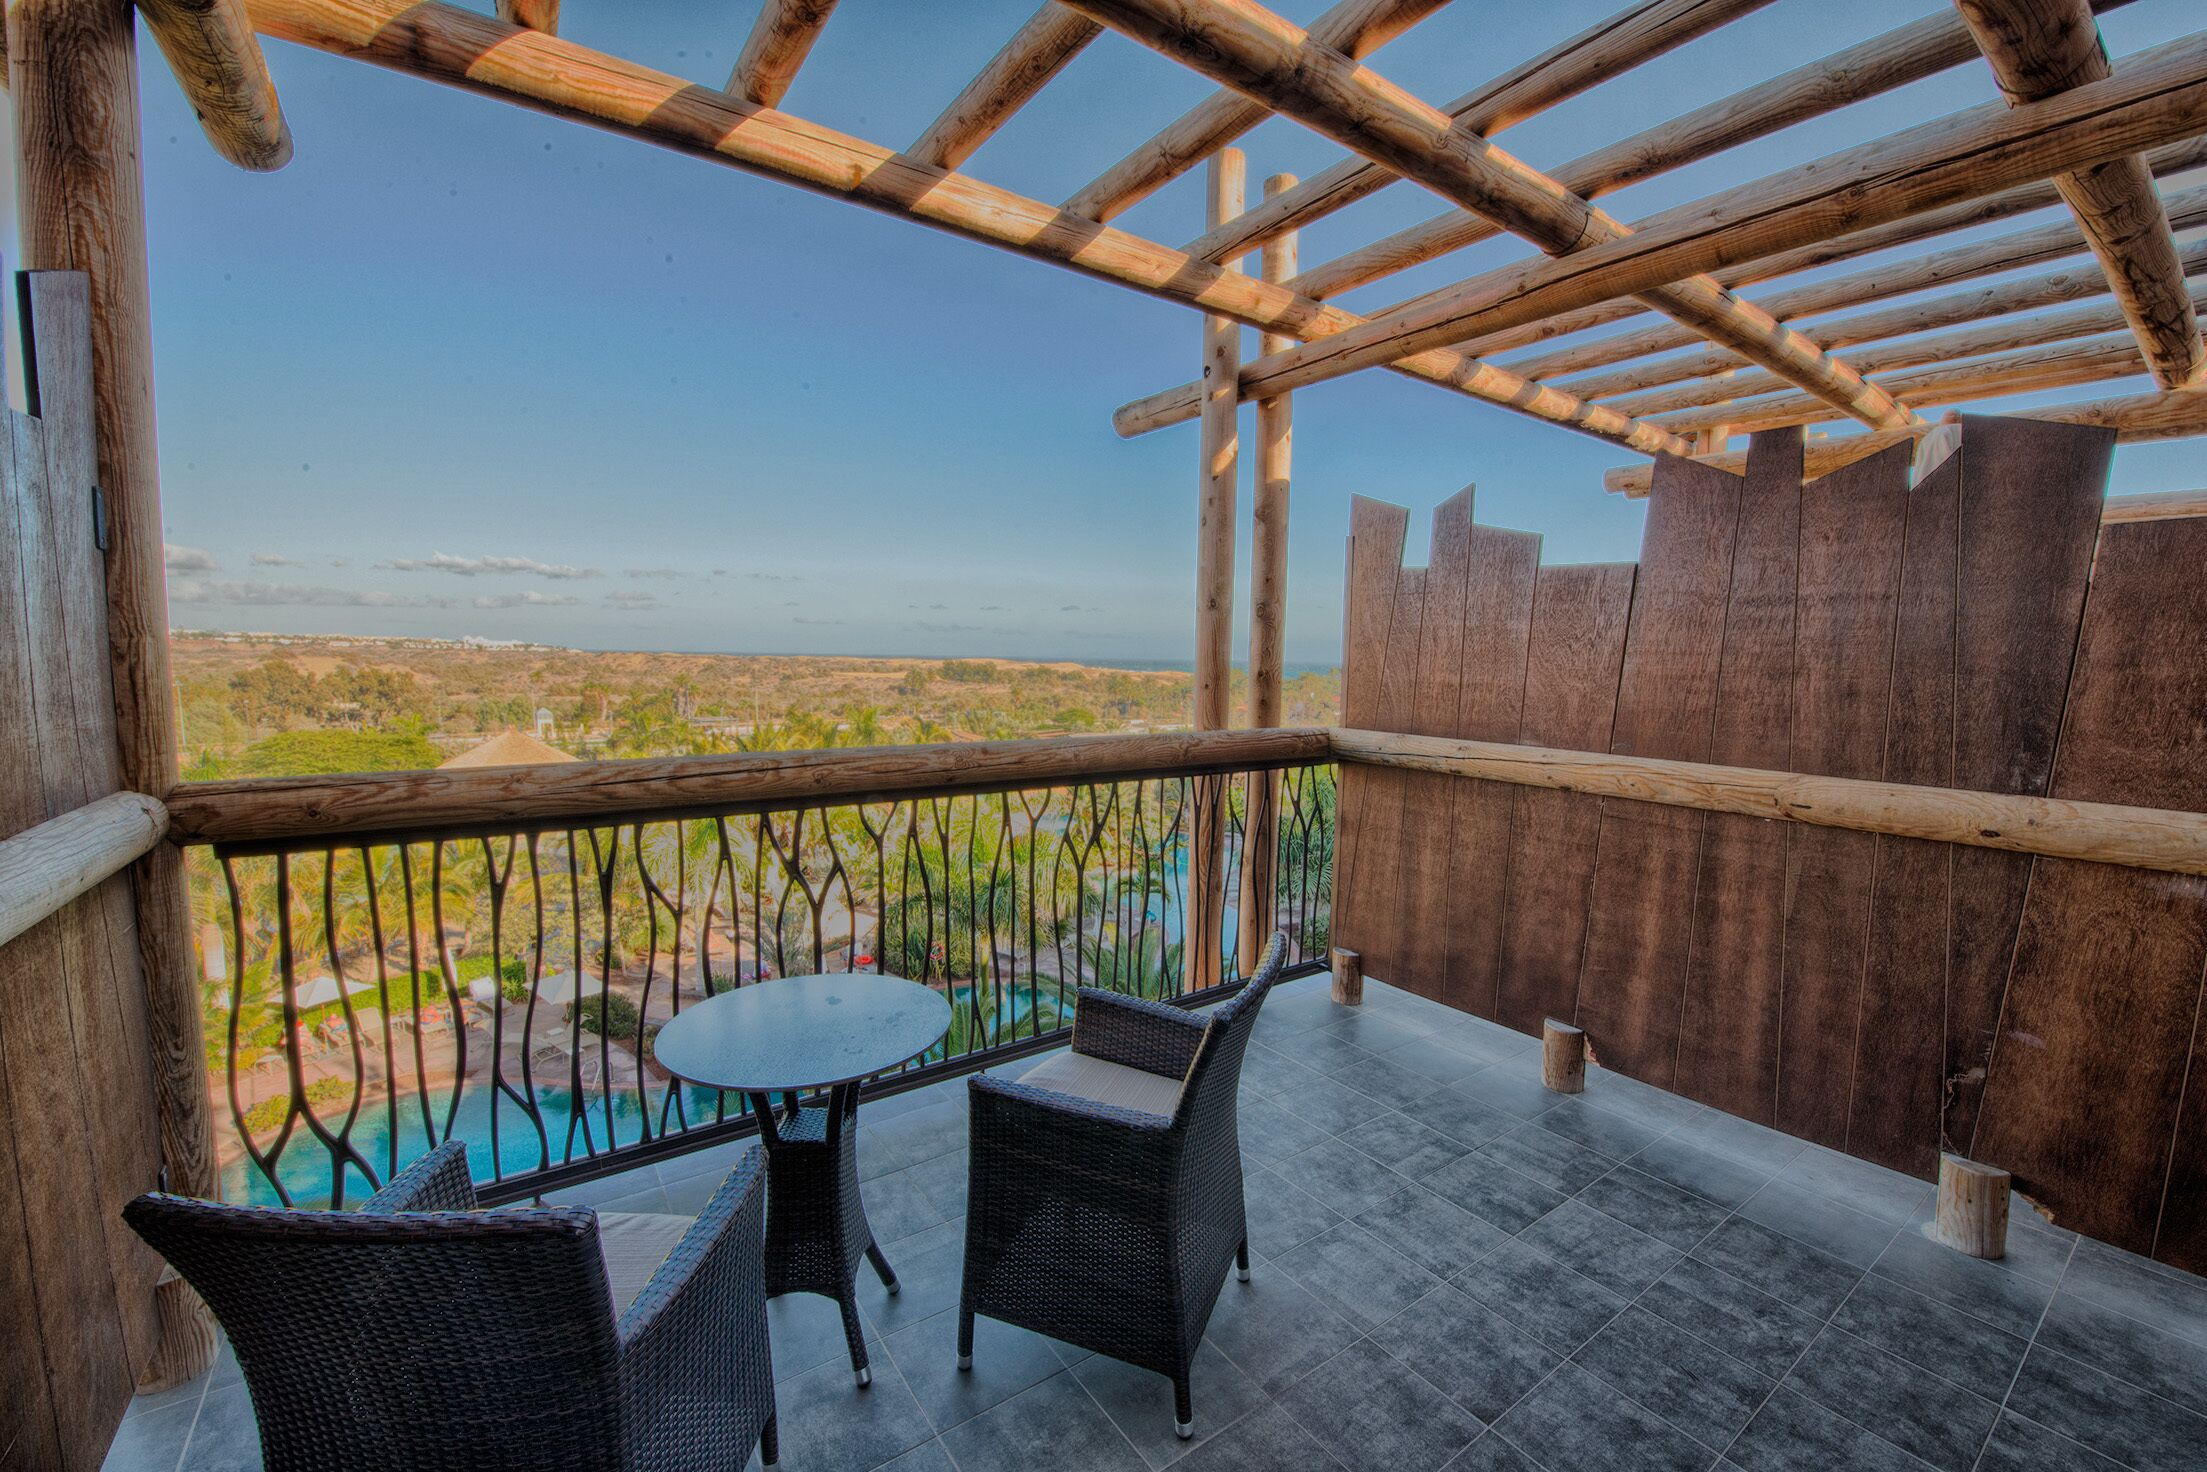 Courtesy of Lopesan Baobab Resort / Expedia.com